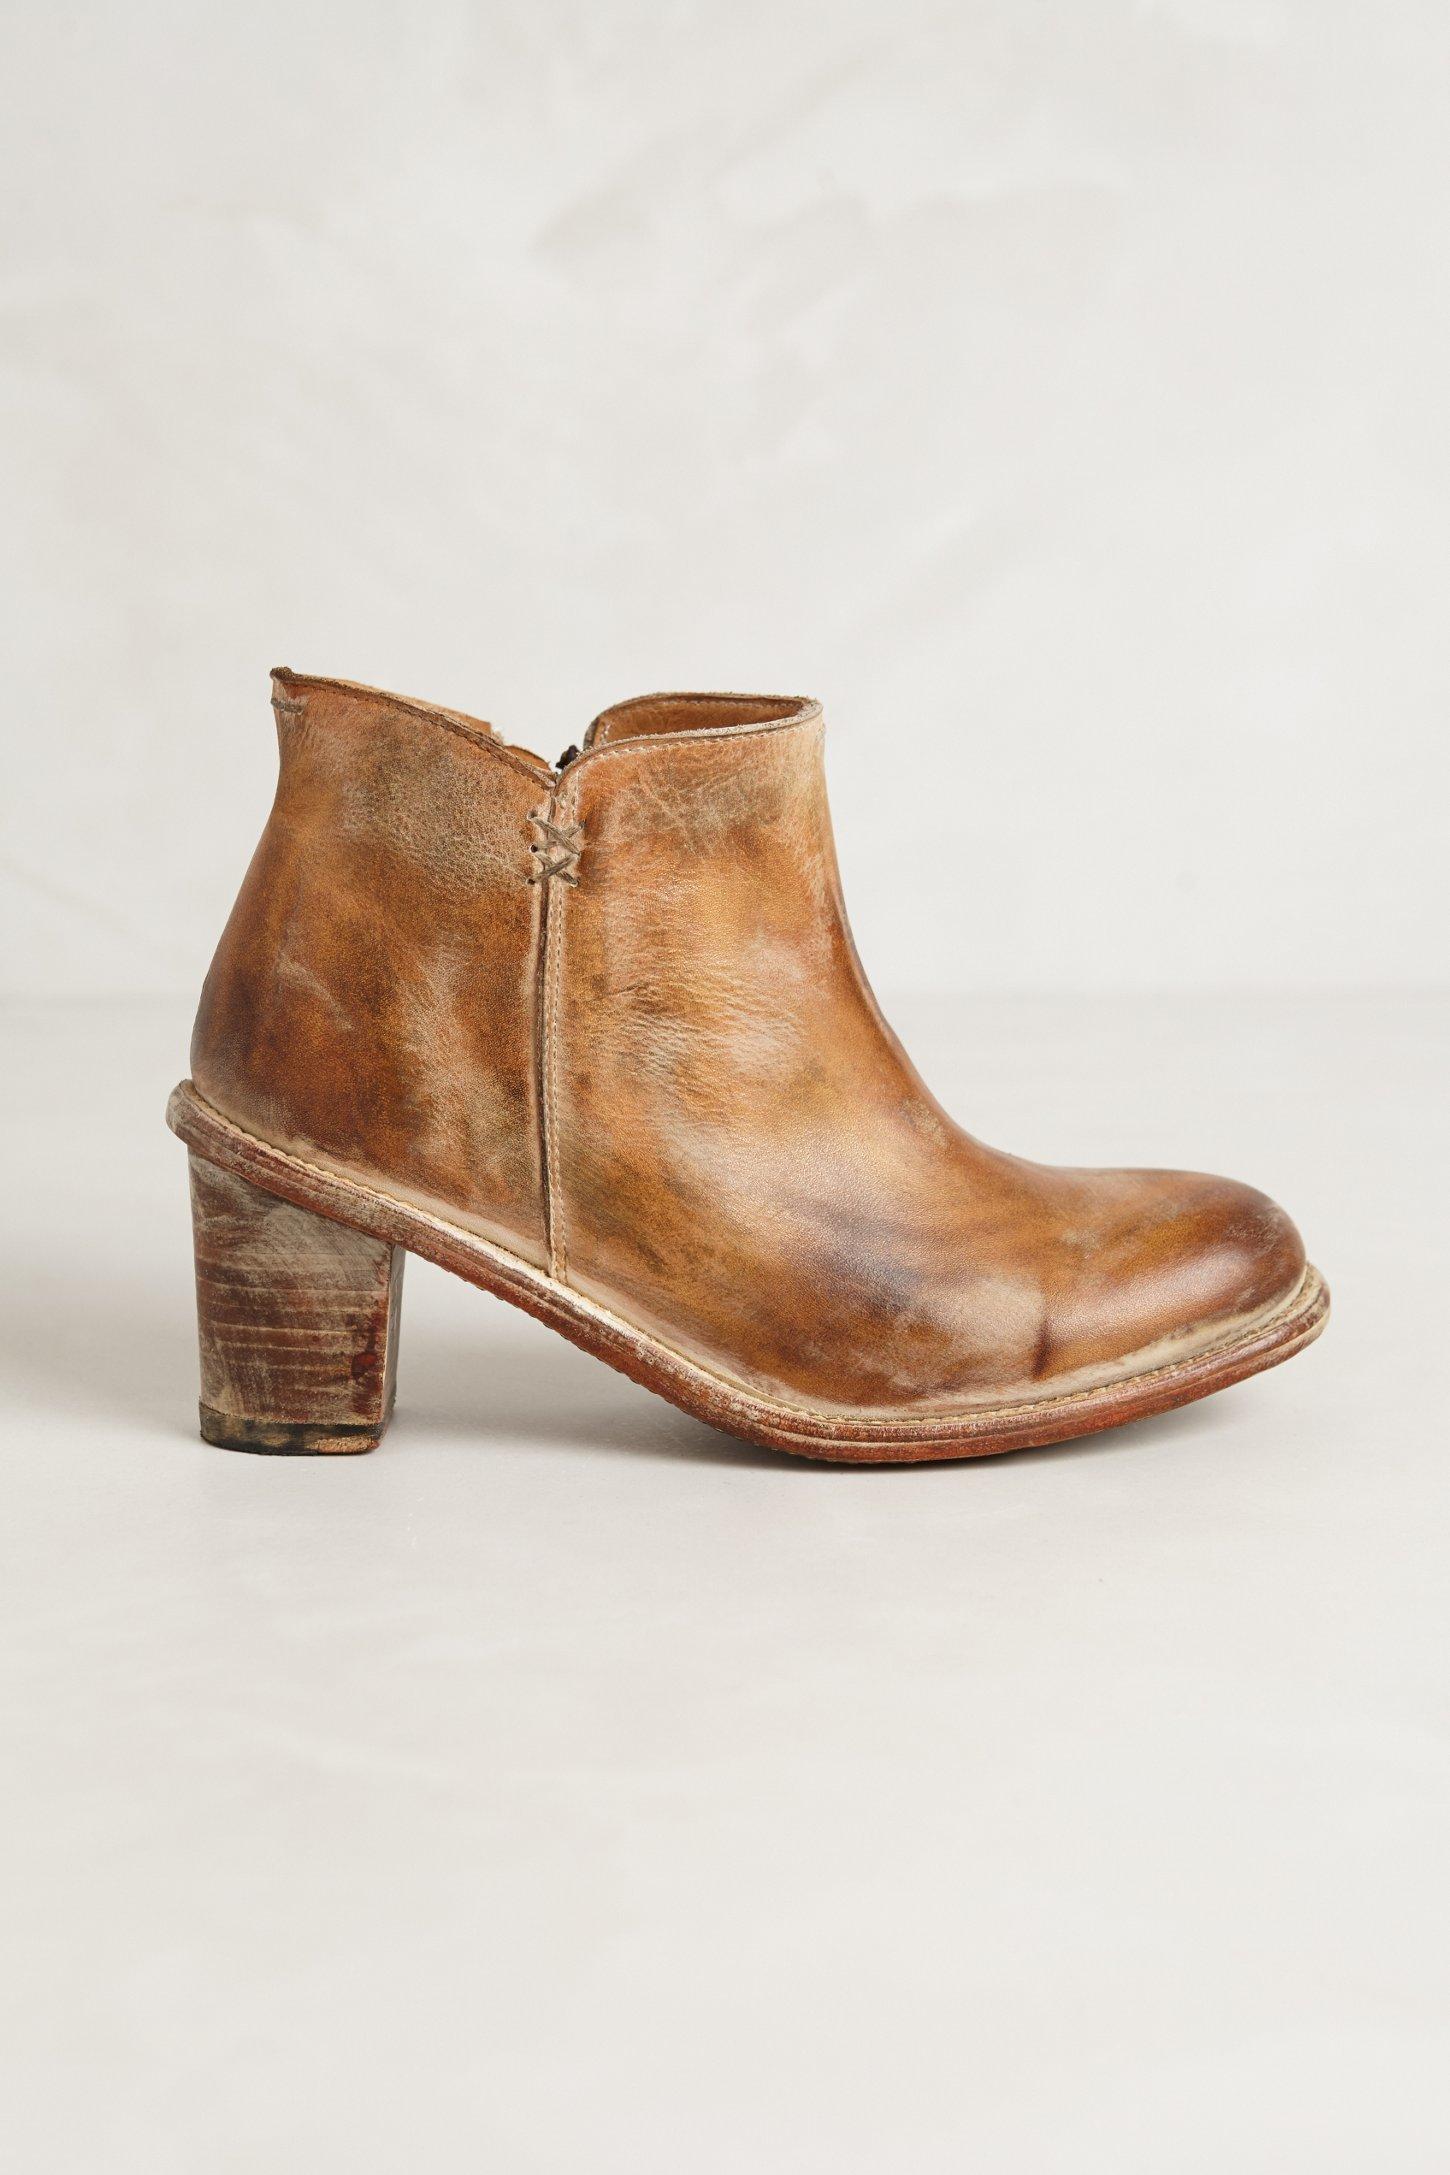 Bed Stu Shoes Womens